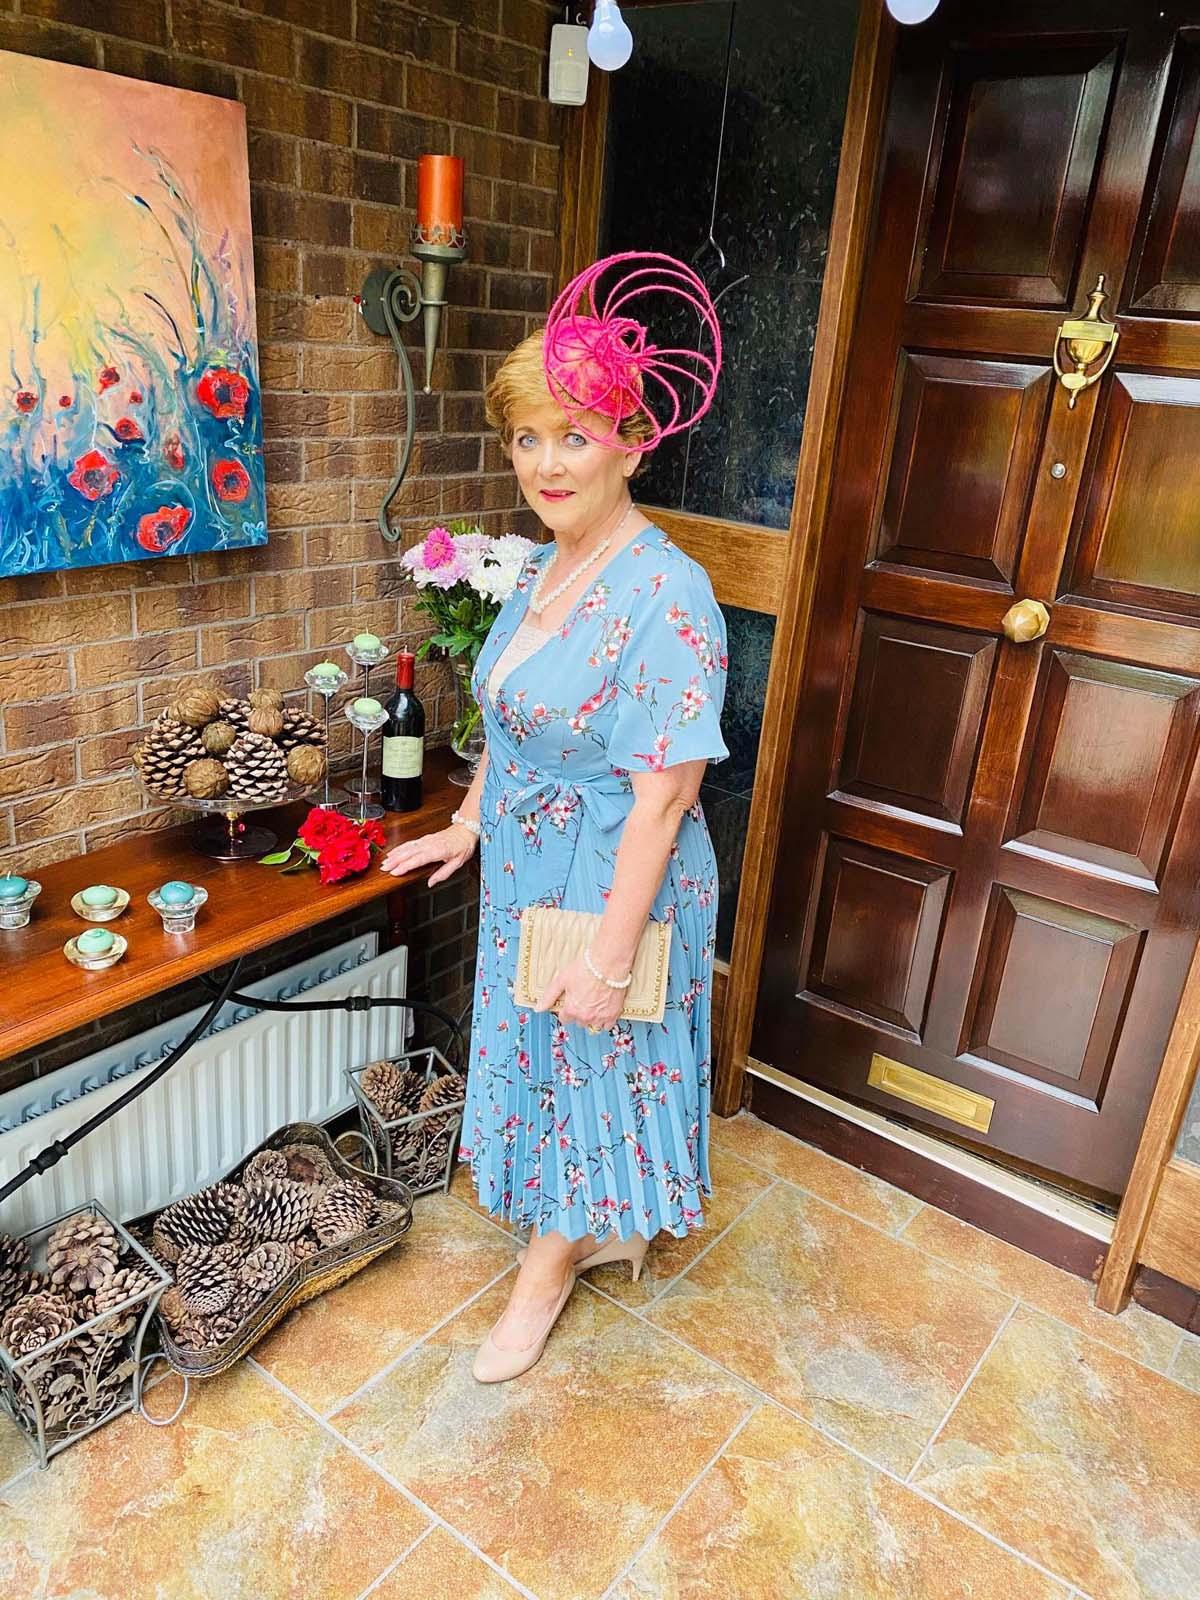 Ballinrobe Races Virtual Ladies Day - Margaret O' Rourke wearing Irish Designer Saraden Designs Millinery Atelier